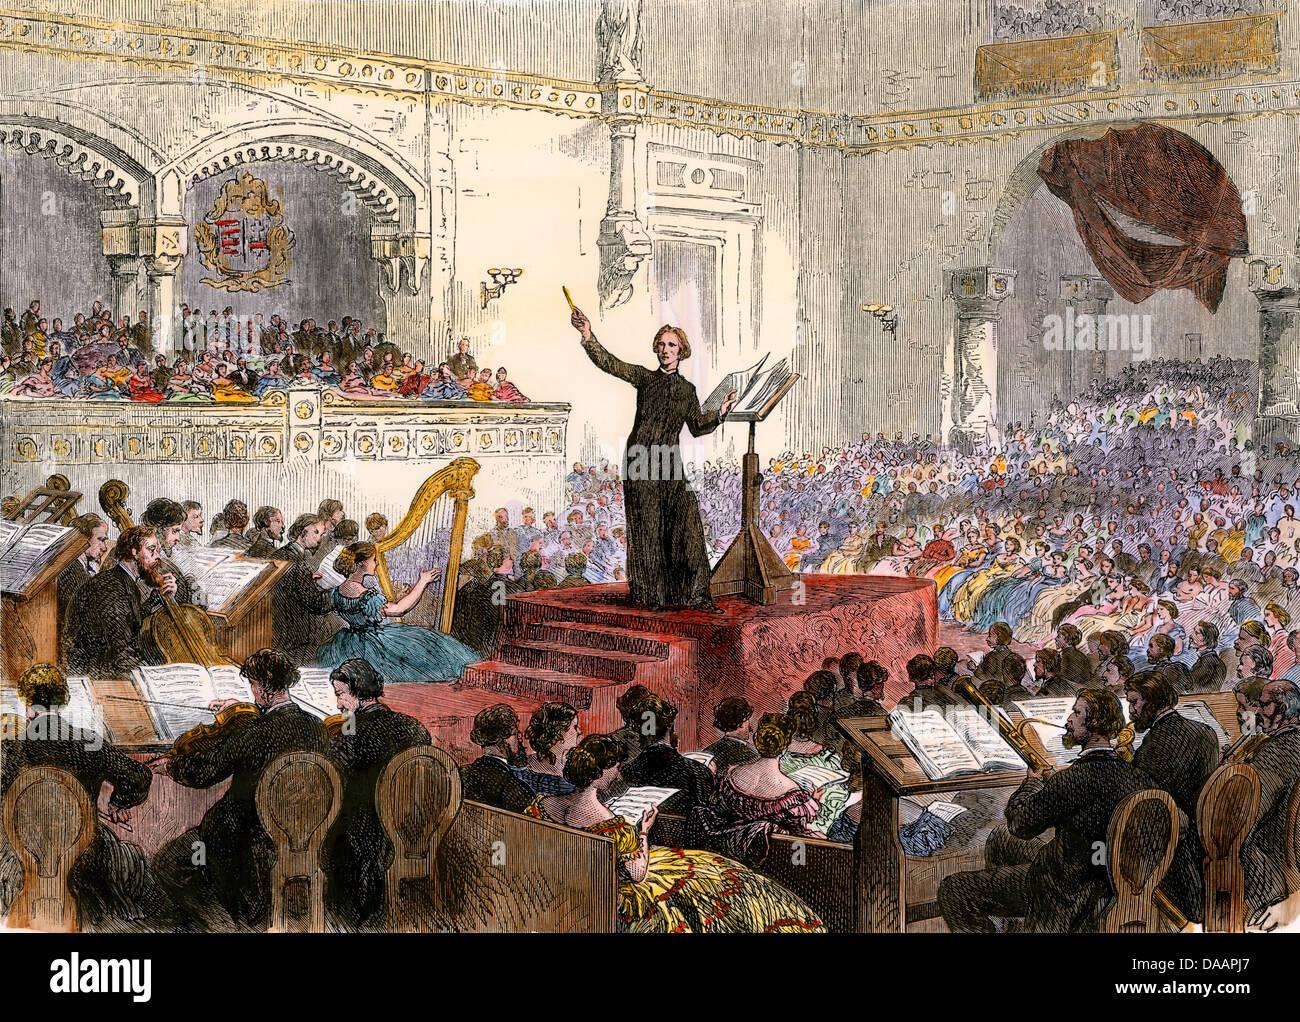 Franzi Liszt conducting his new Oratorio at Budapest, Hungary, 1860s. - Stock Image